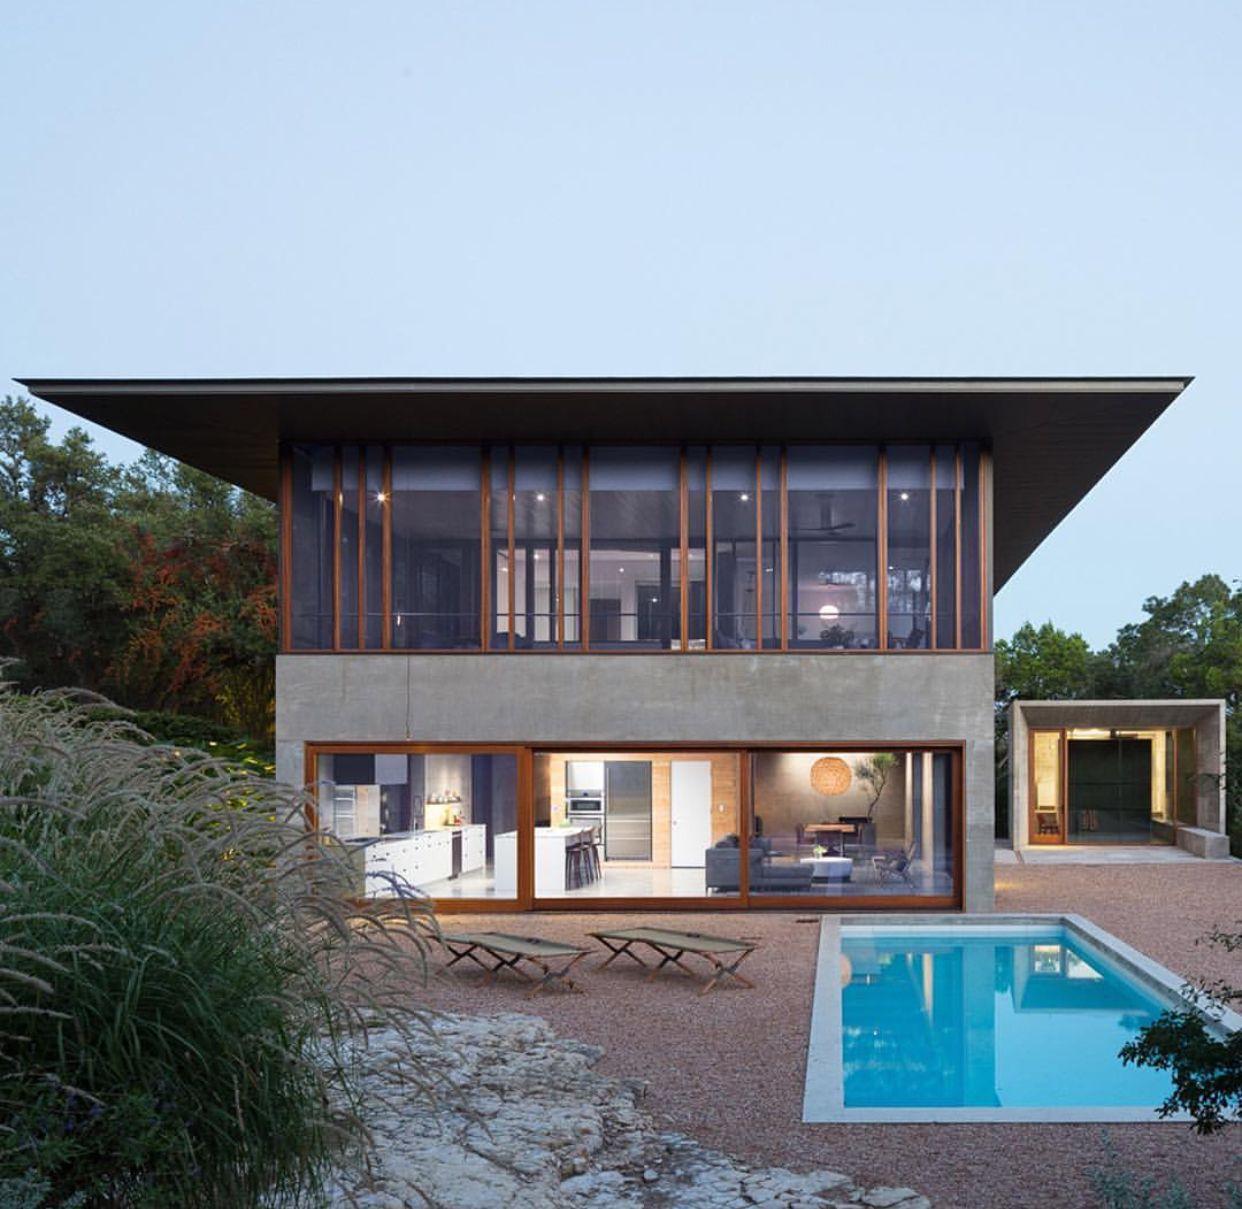 Pin by Ignacio Argandona on Mike&Sahsha's house ideas